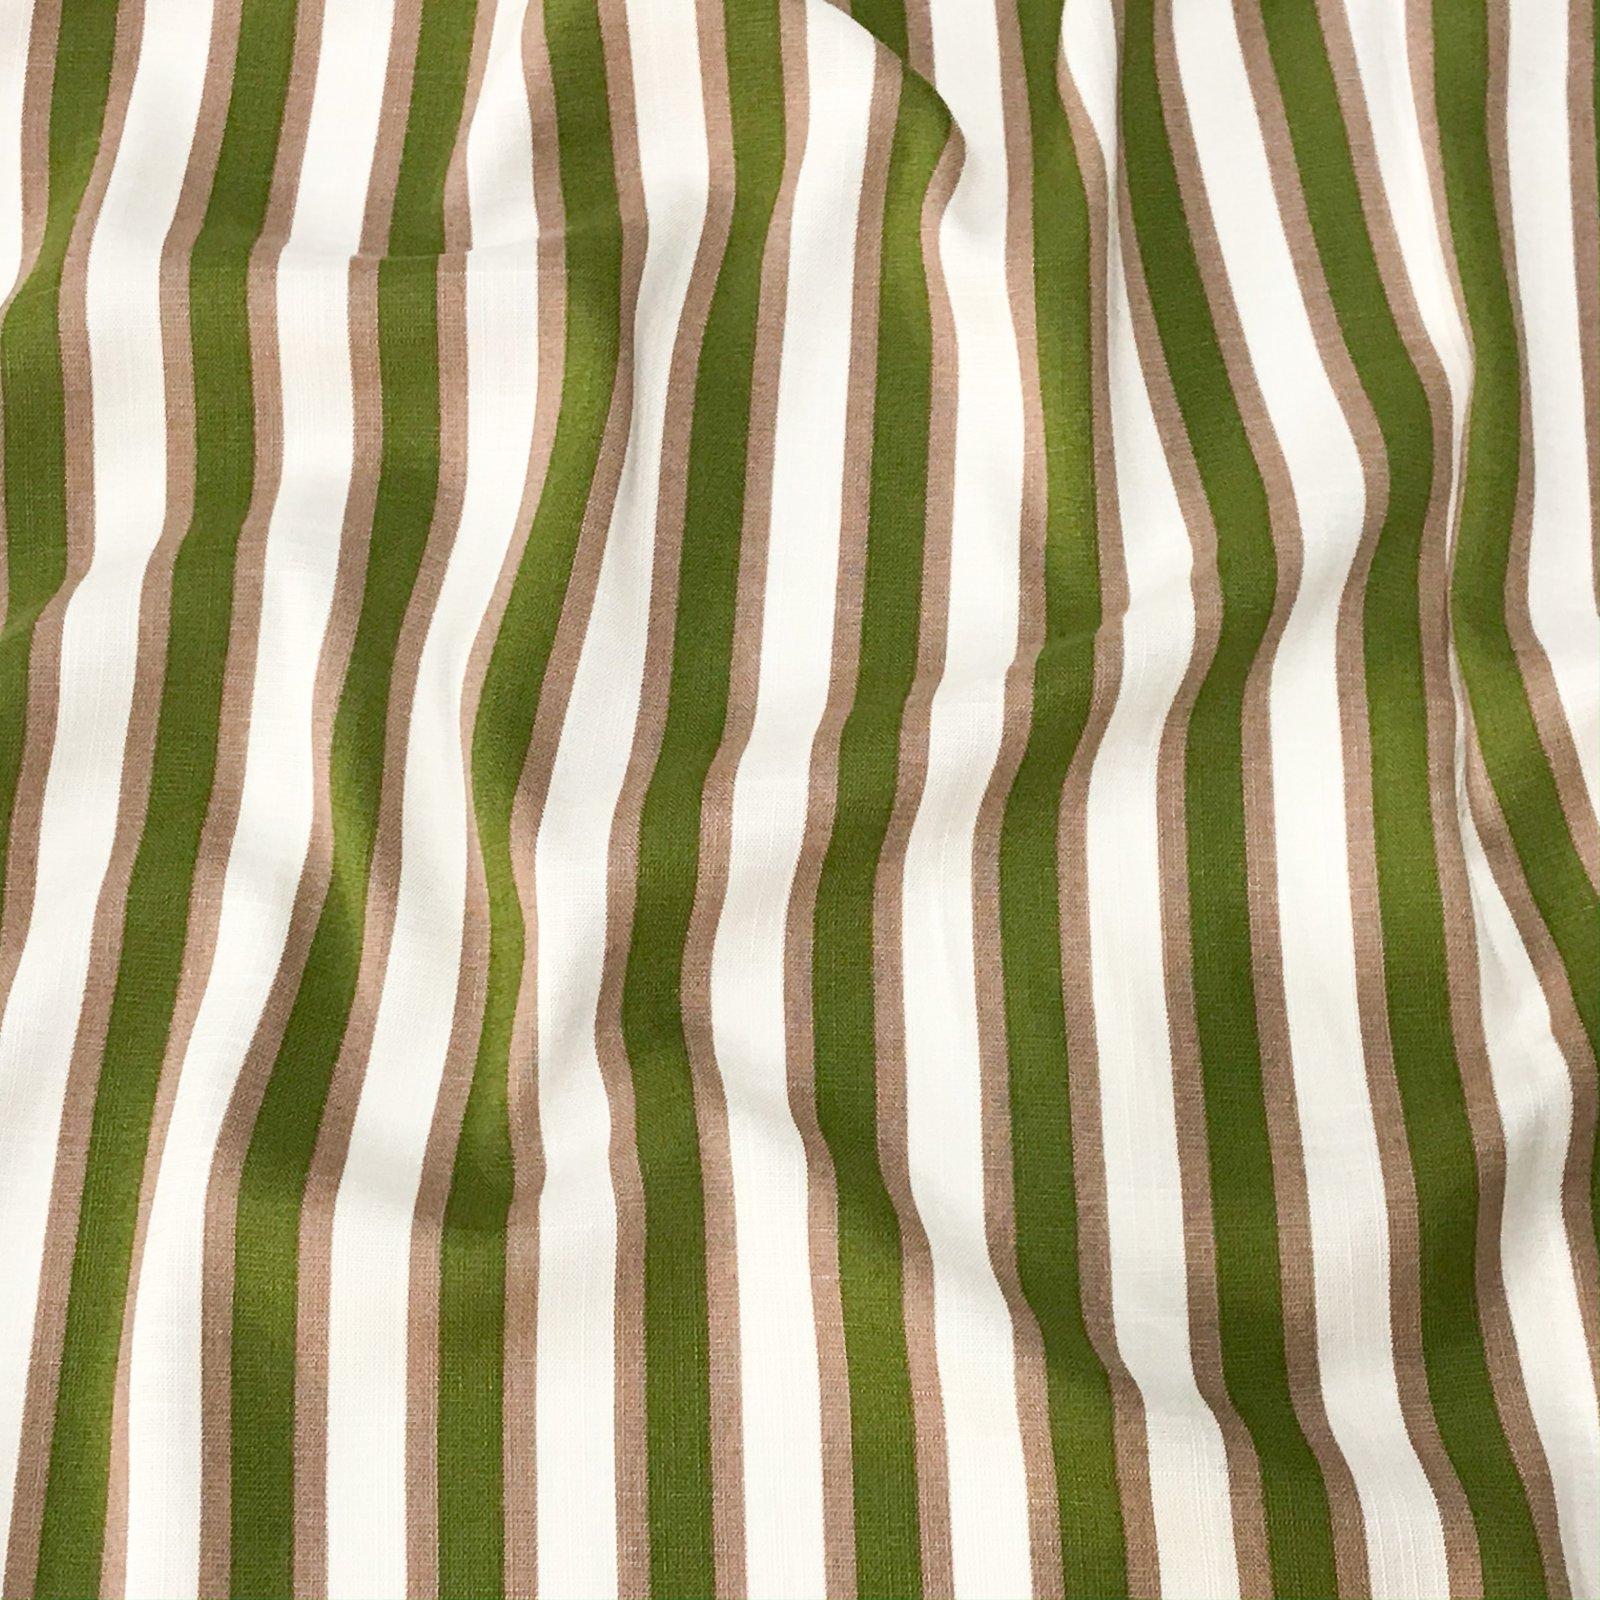 Rayon Stripes - Taupe & Lime